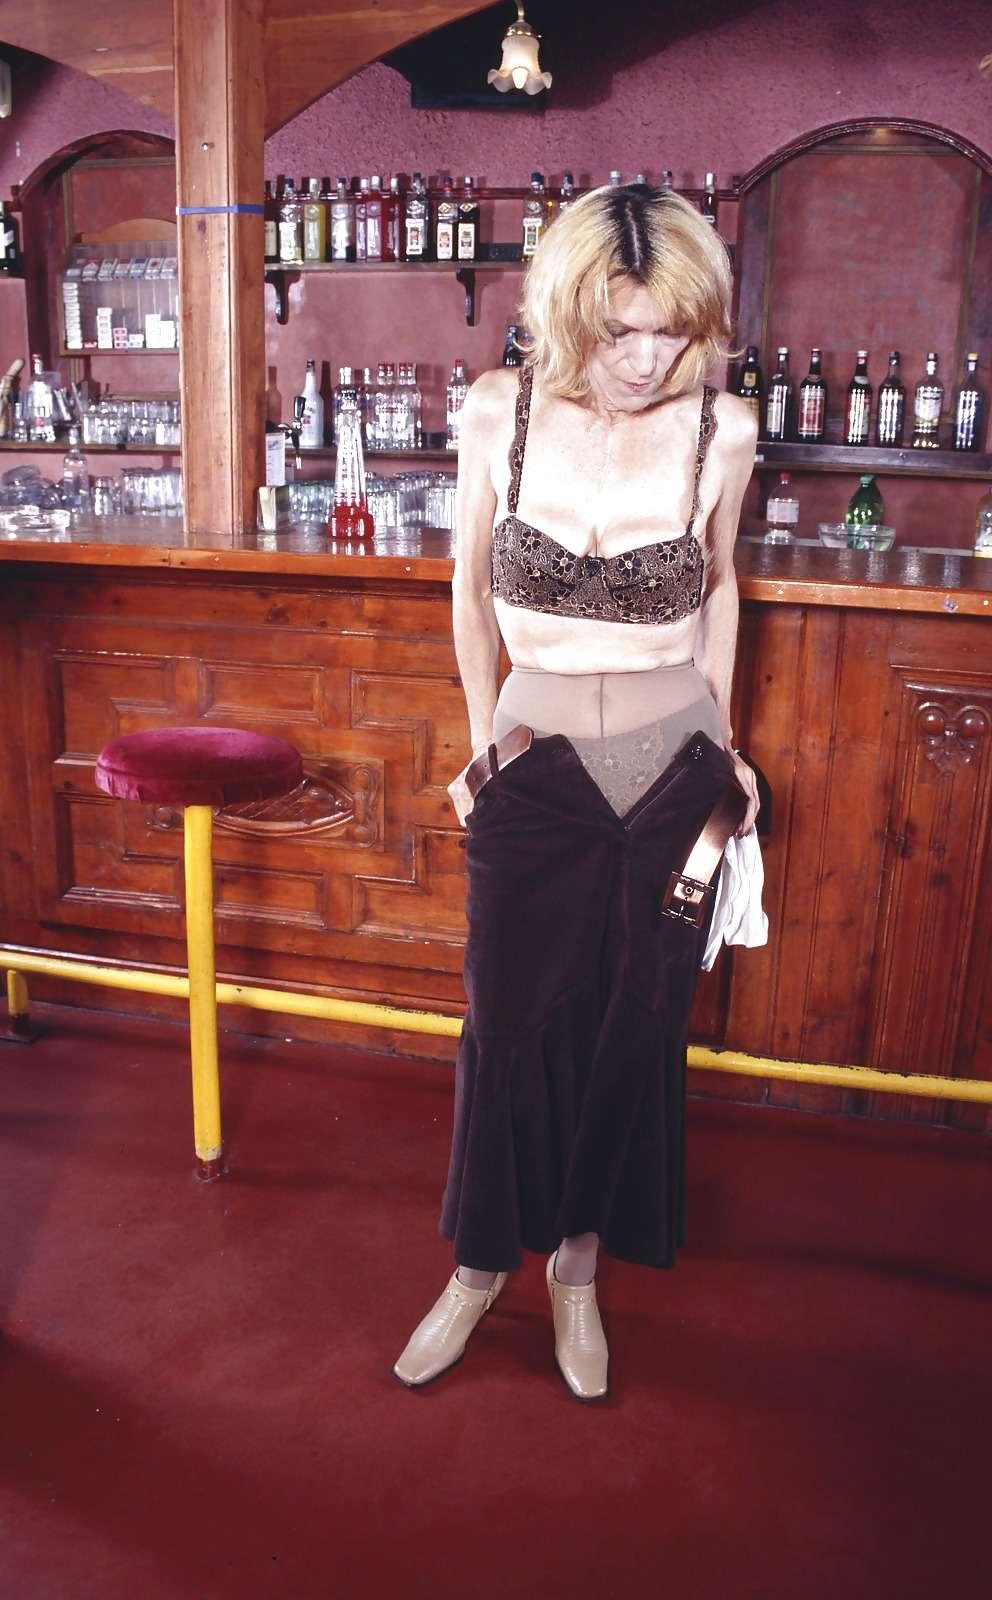 Skinny Hungarian Granny Pira in the bar, Hot Granny Pussy